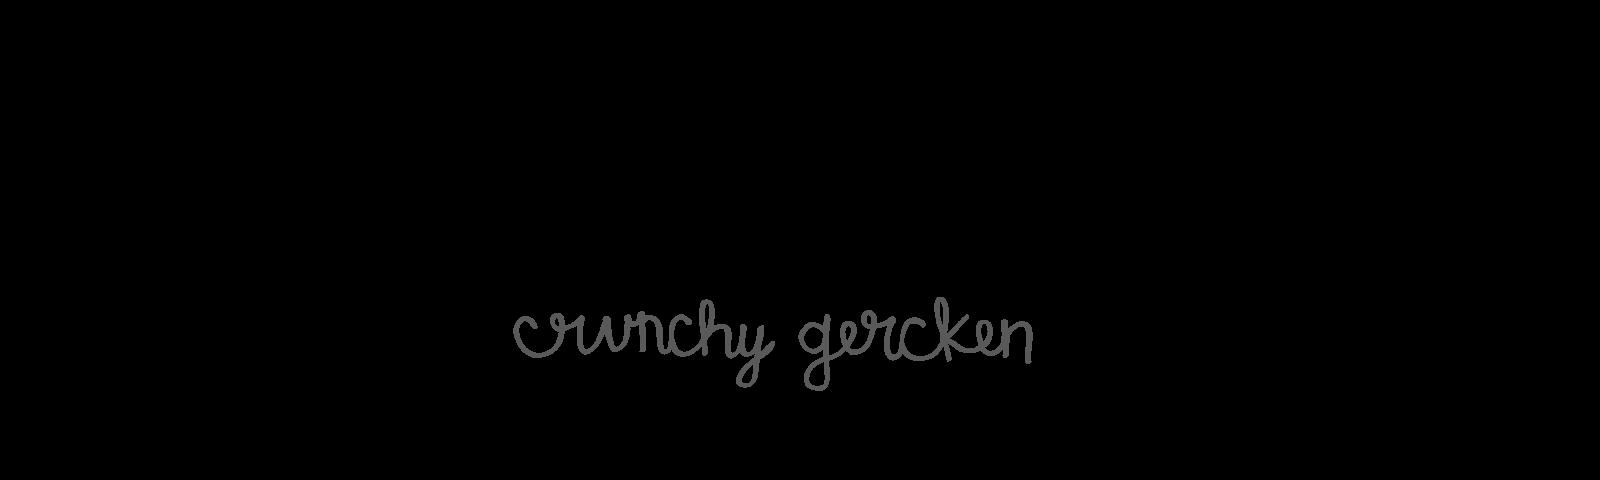 Crunchy Gercken